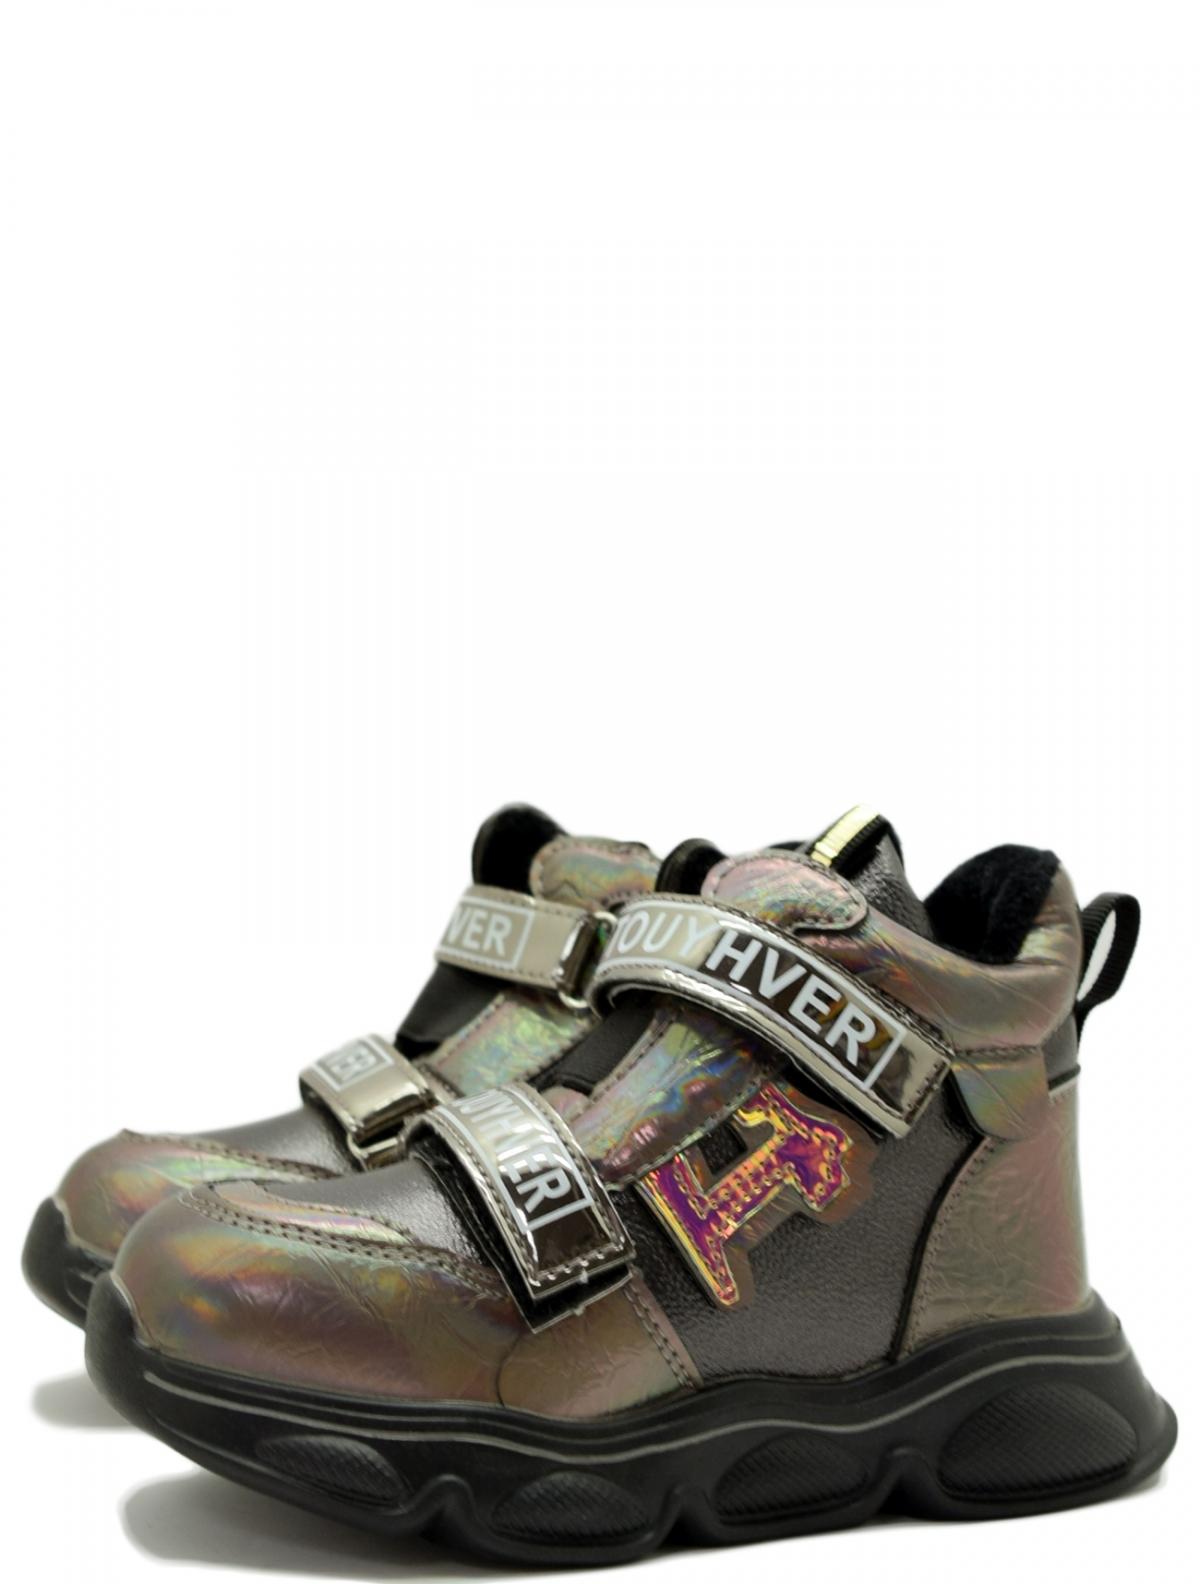 Jong Golf B2939-0 кроссовки для девочки